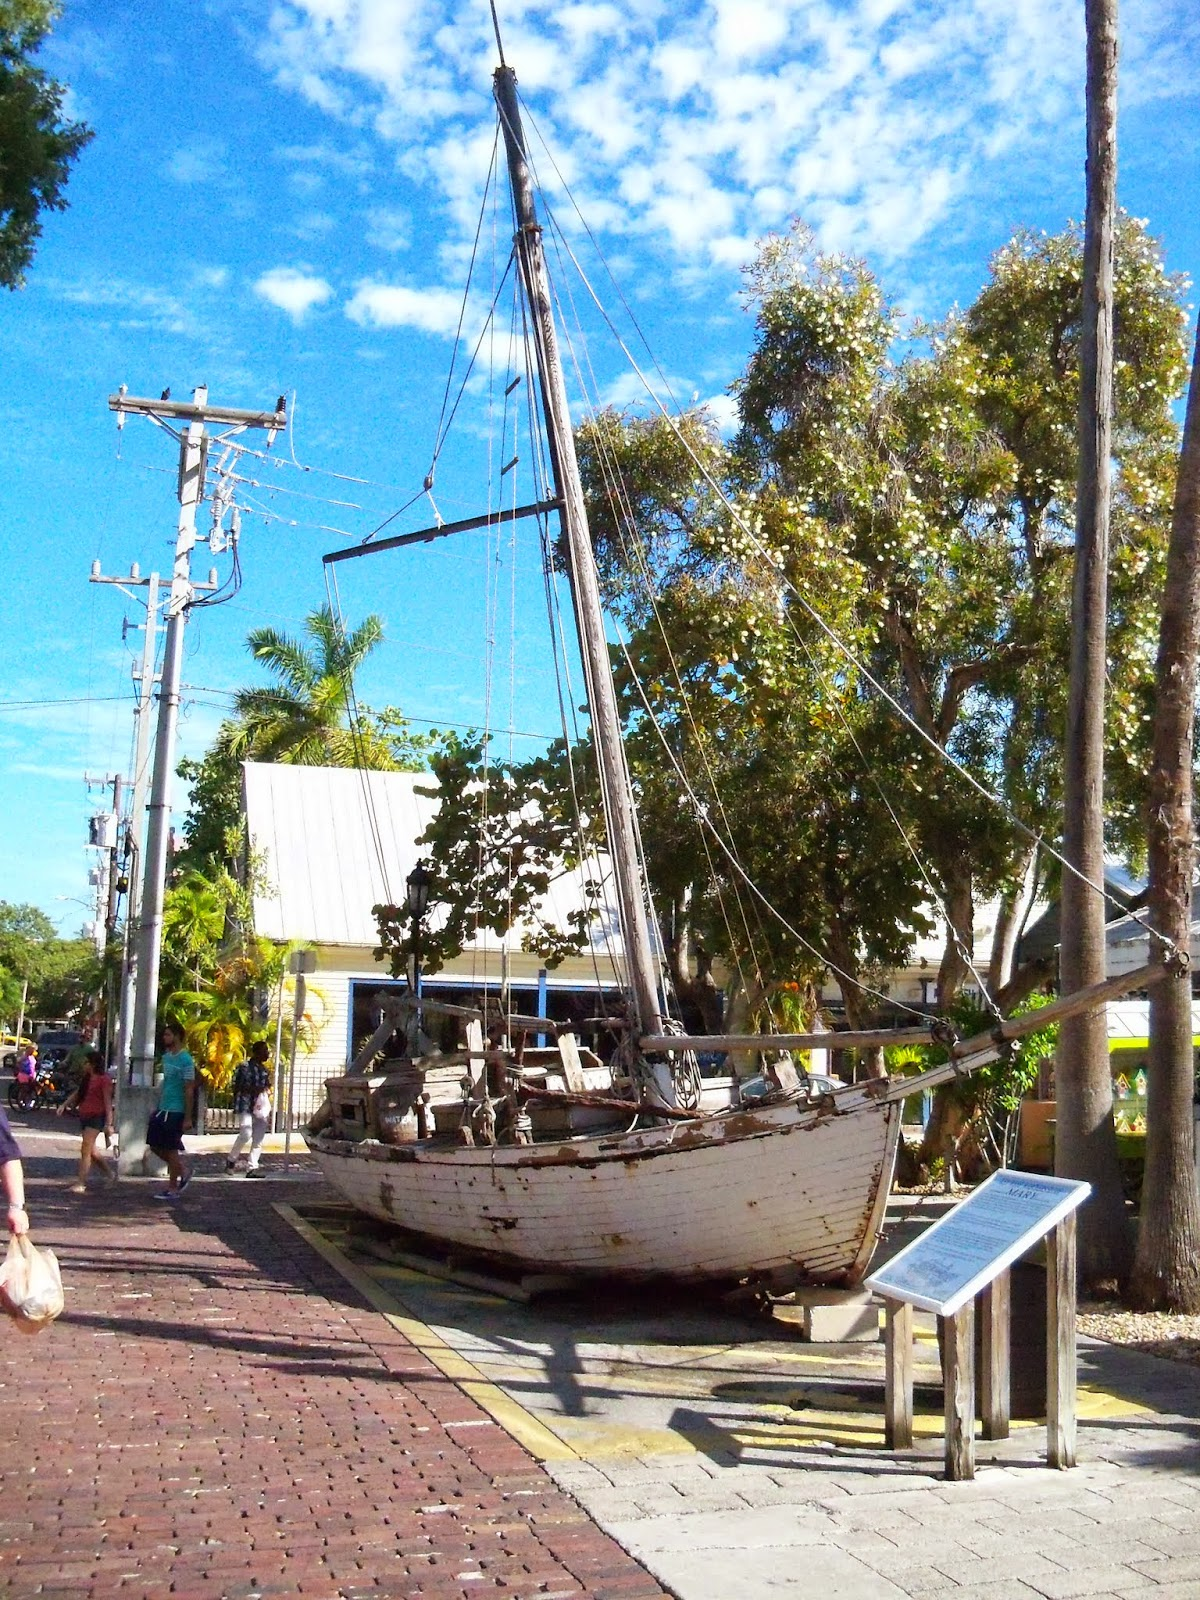 Key West Vacation - 116_5675.JPG